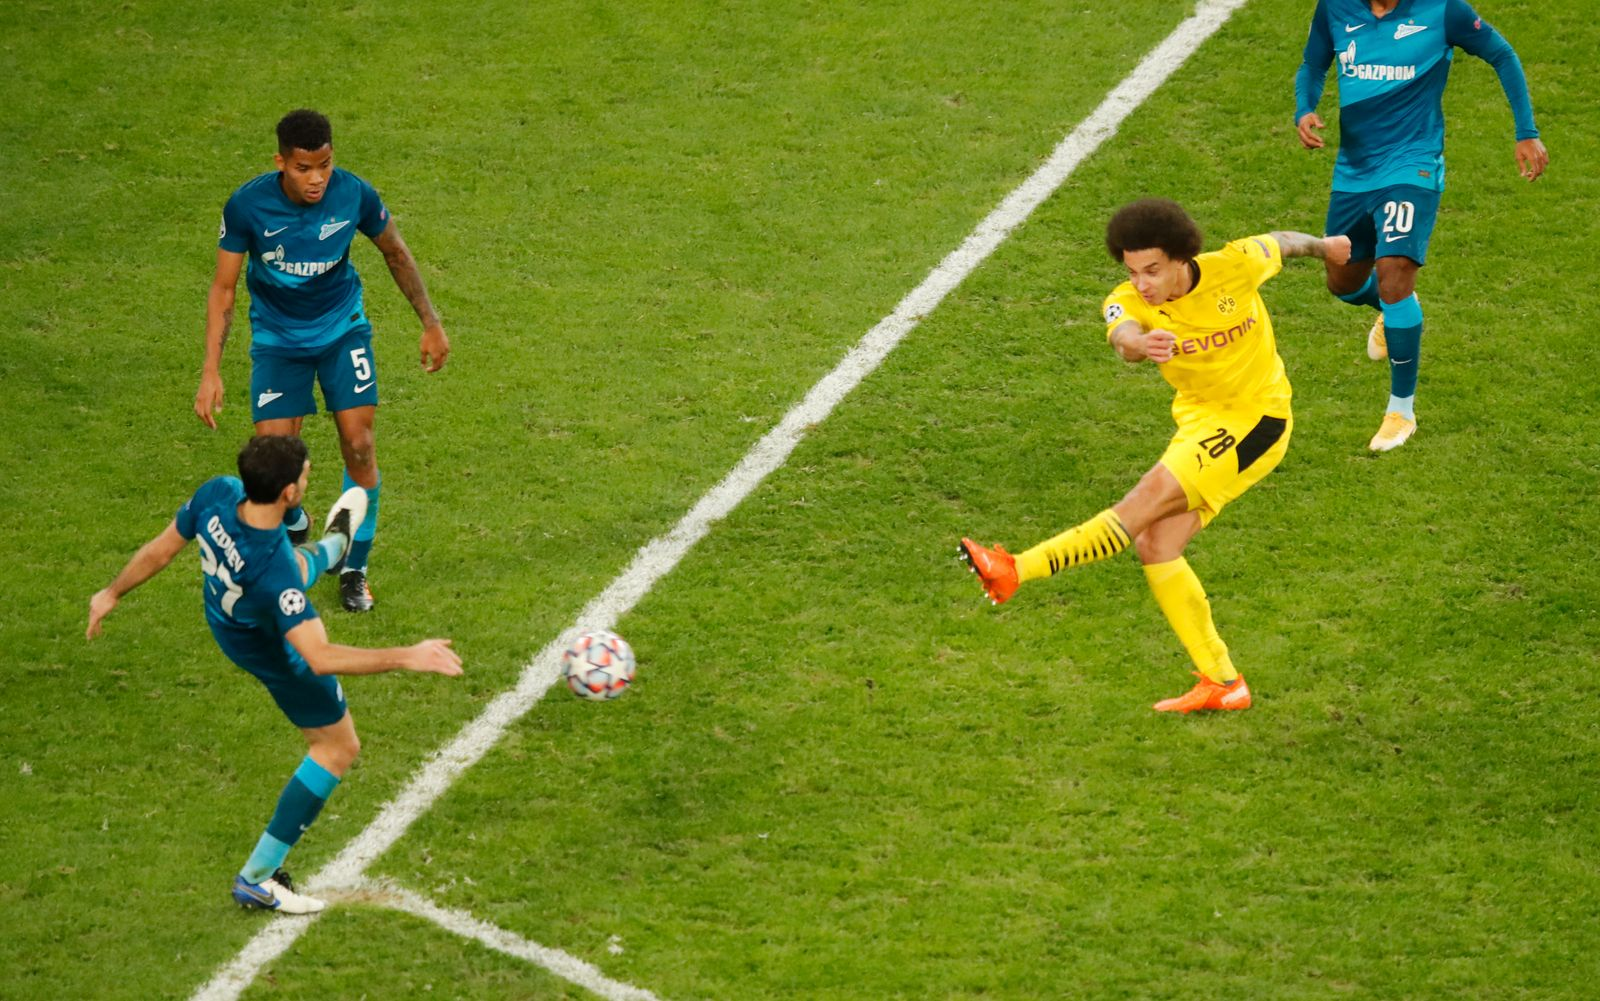 Champions League - Group F - Zenit Saint Petersburg v Borussia Dortmund